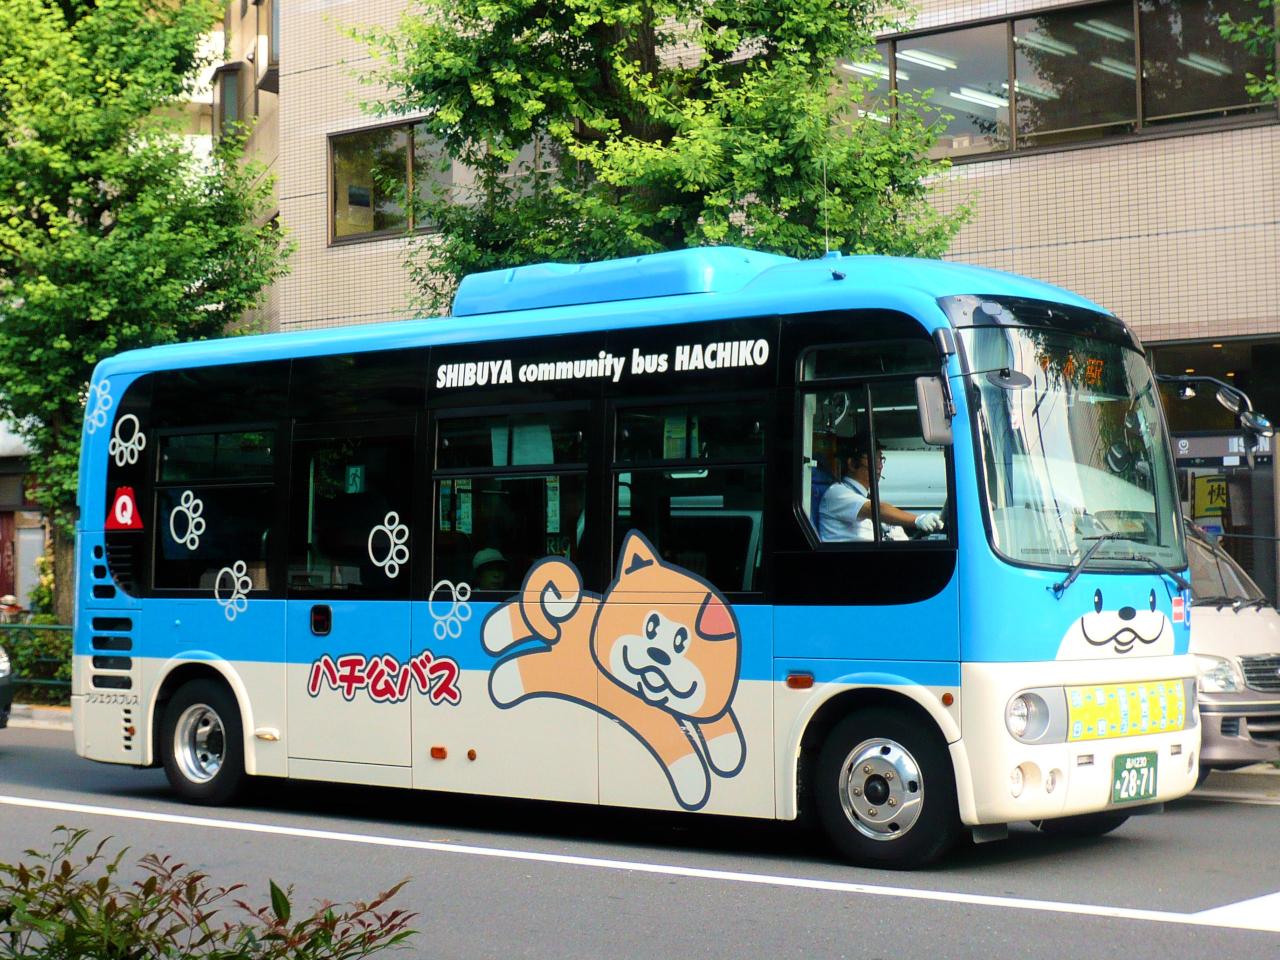 Shibuya community bus Hachiko